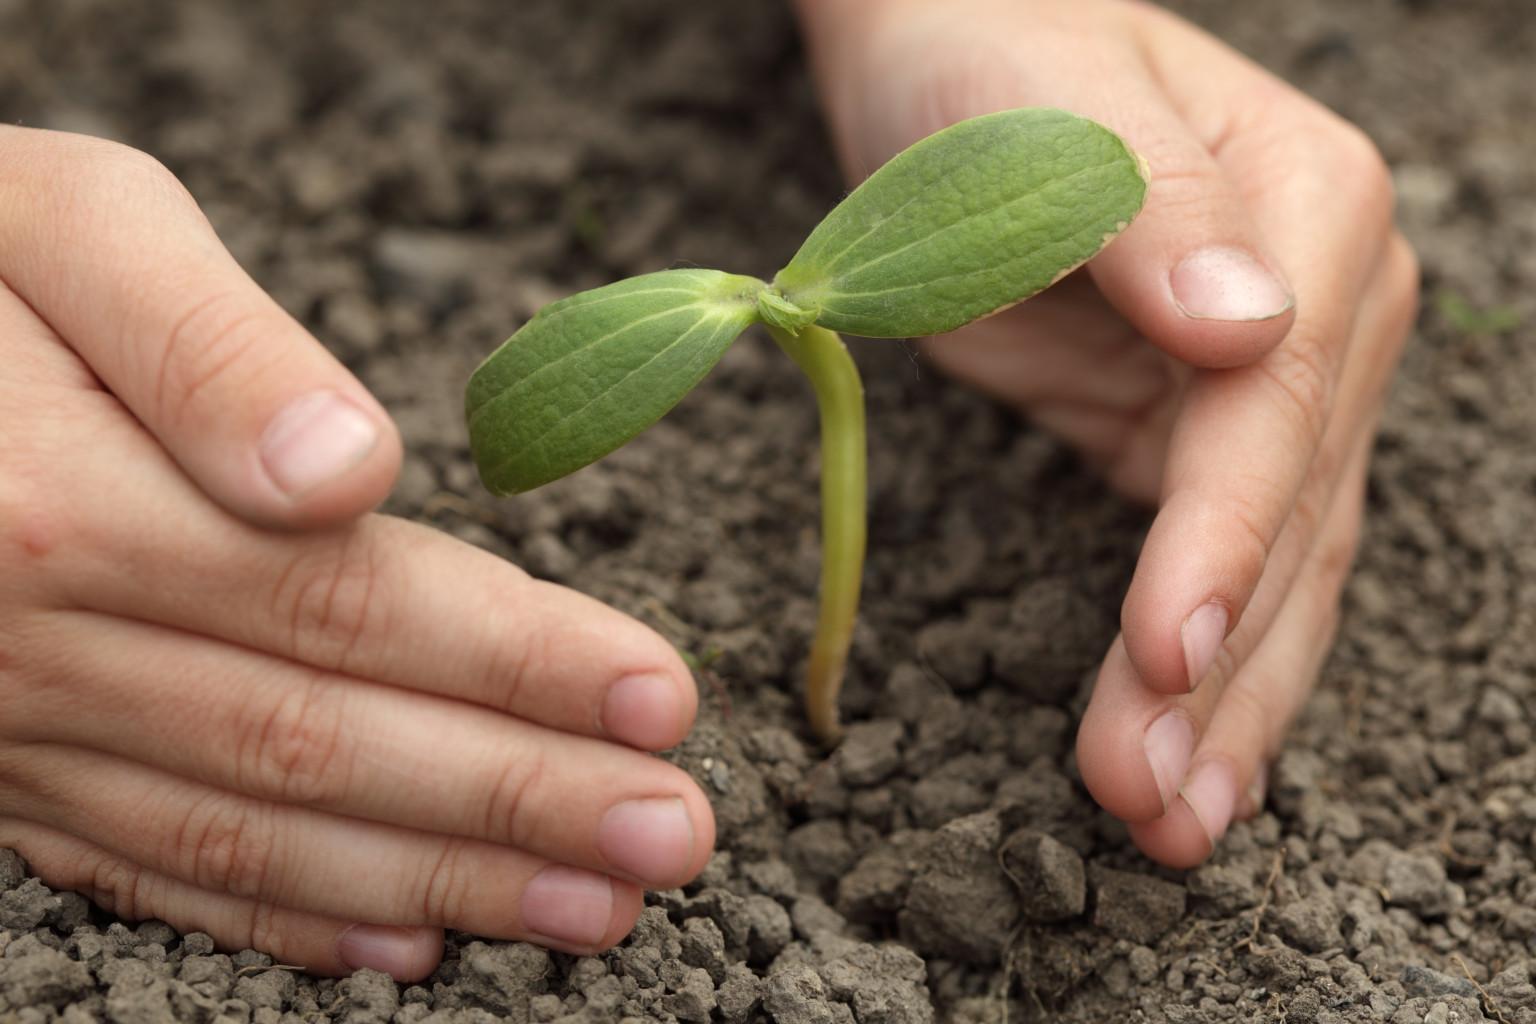 Planting saplings with pocket money